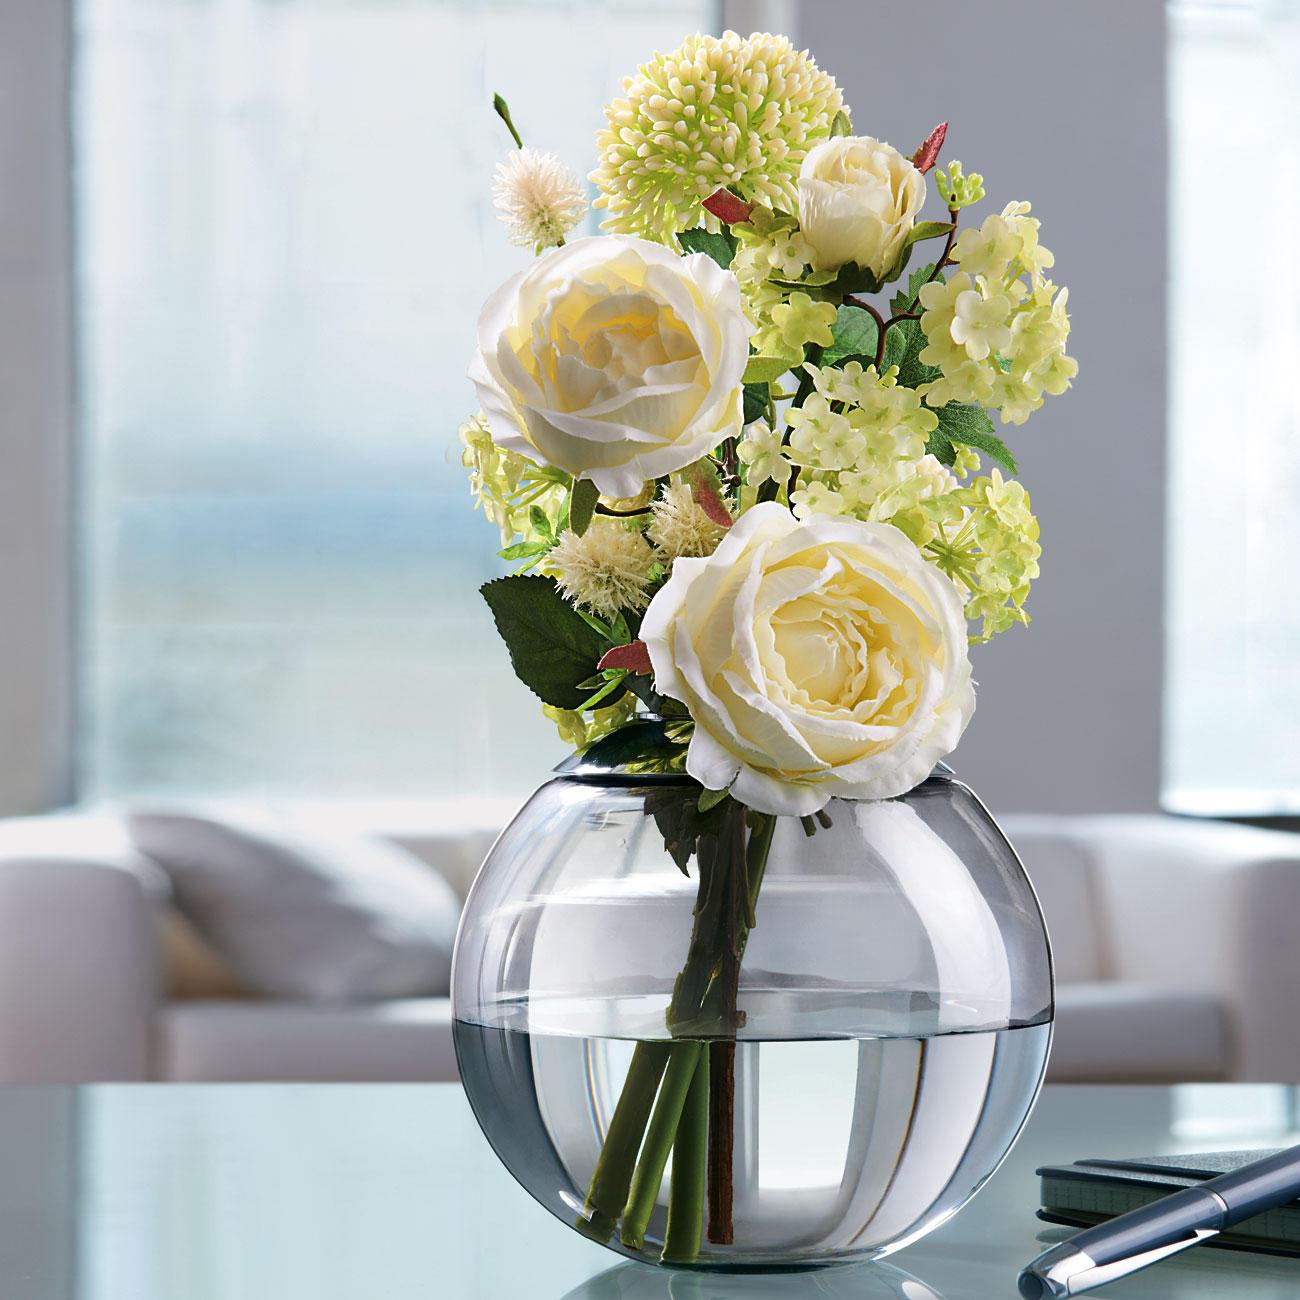 Variable Blumenvase 3 Jahre Garantie Pro Idee